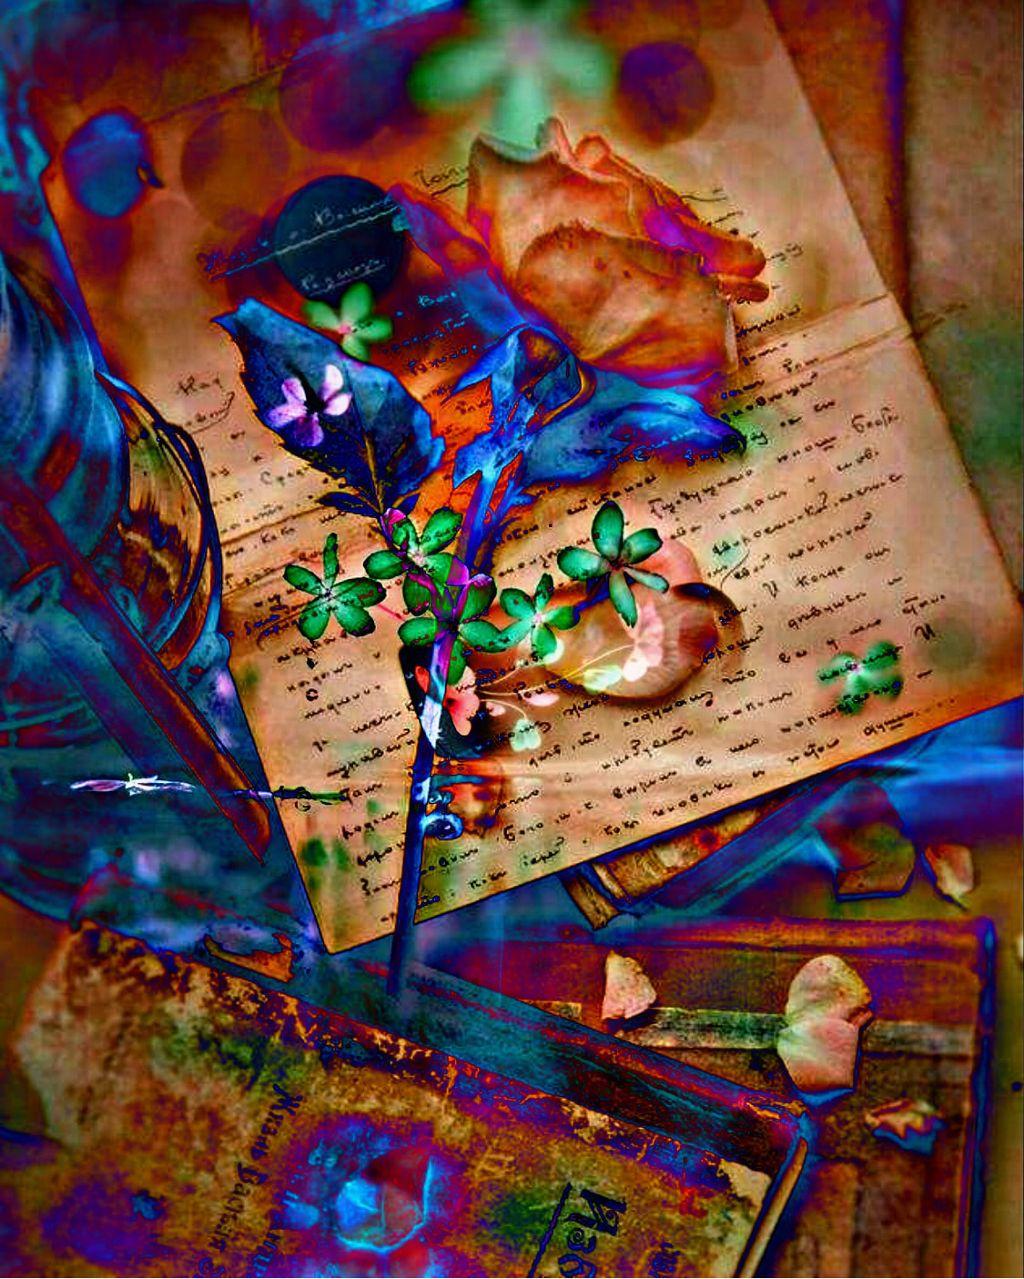 #freetoedit #doubleexposure #rose #rosepetals #flower #books #words #overlayeffect #darklight